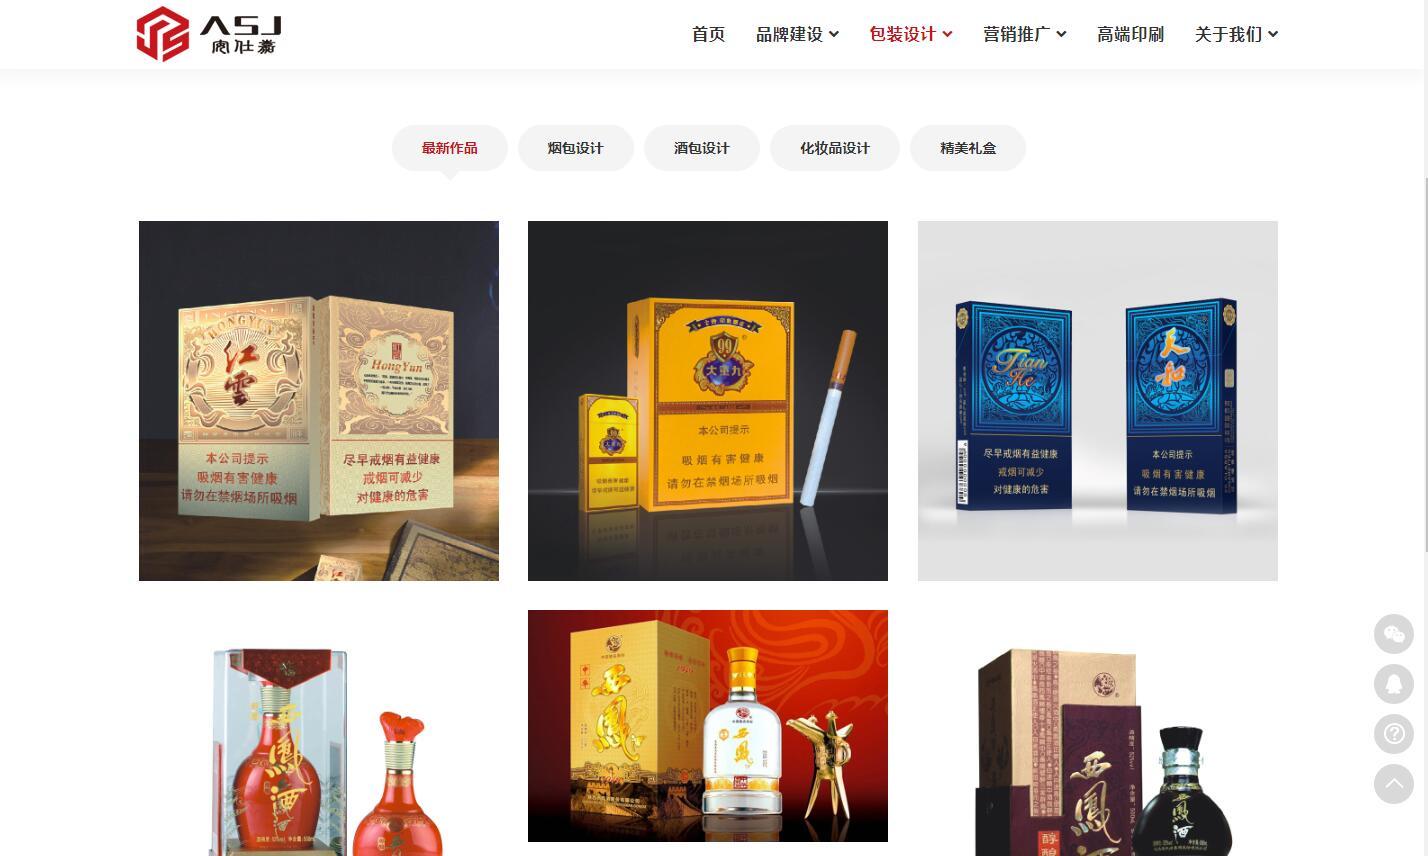 iRedResponsiveDesign红色自适应设计公司企业网站定制